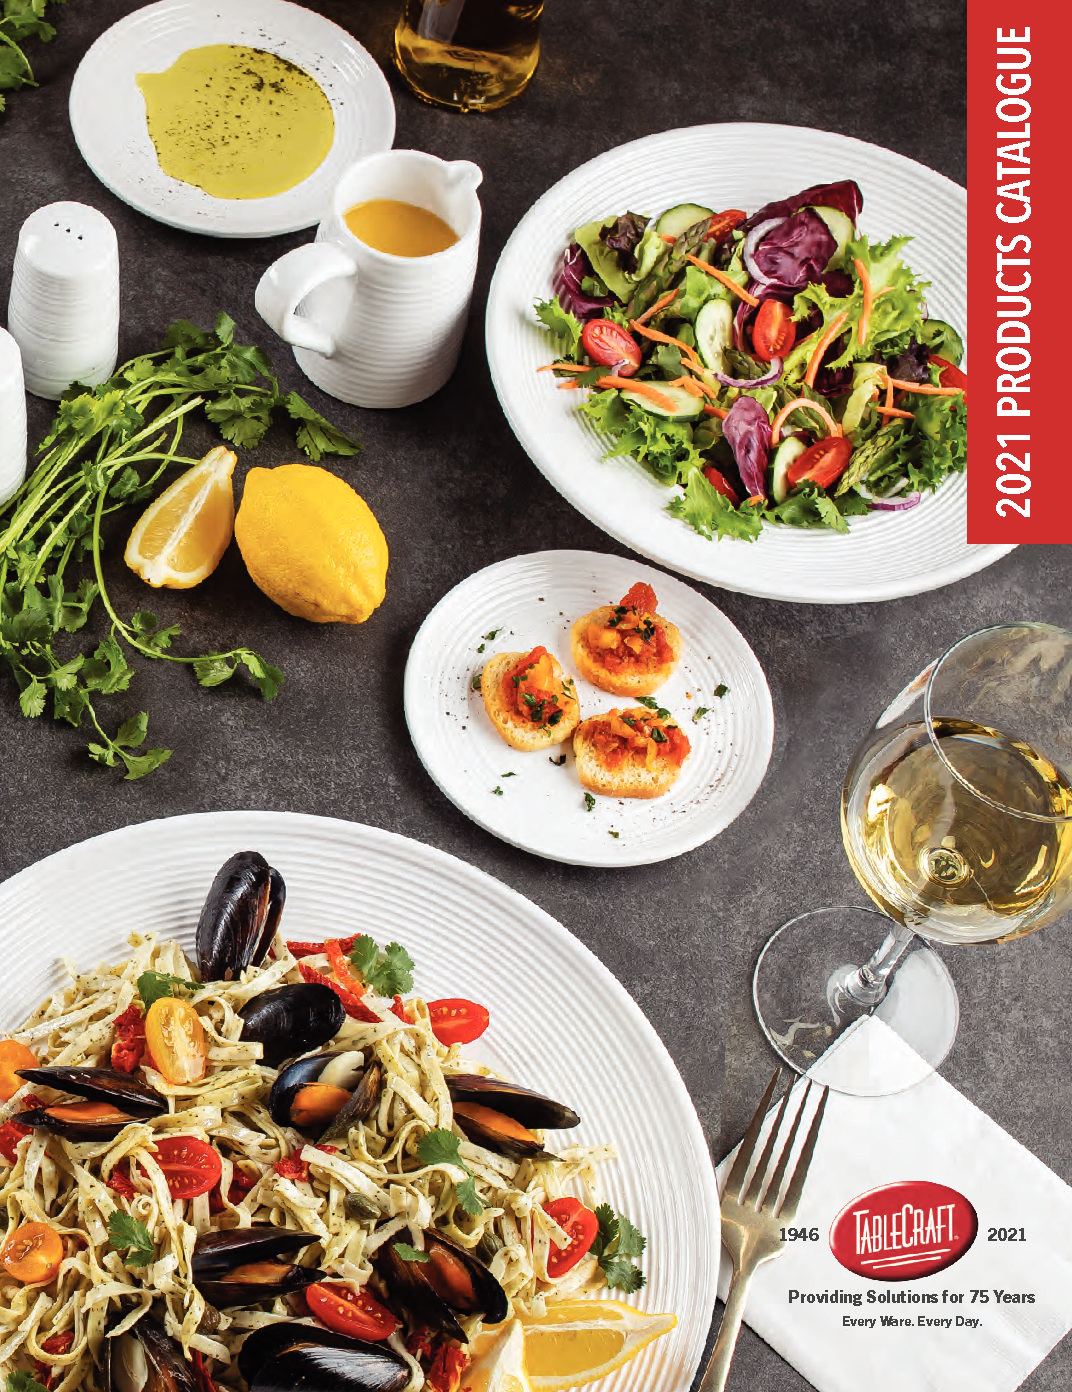 TableCraft_Foodservice_EU_GBP